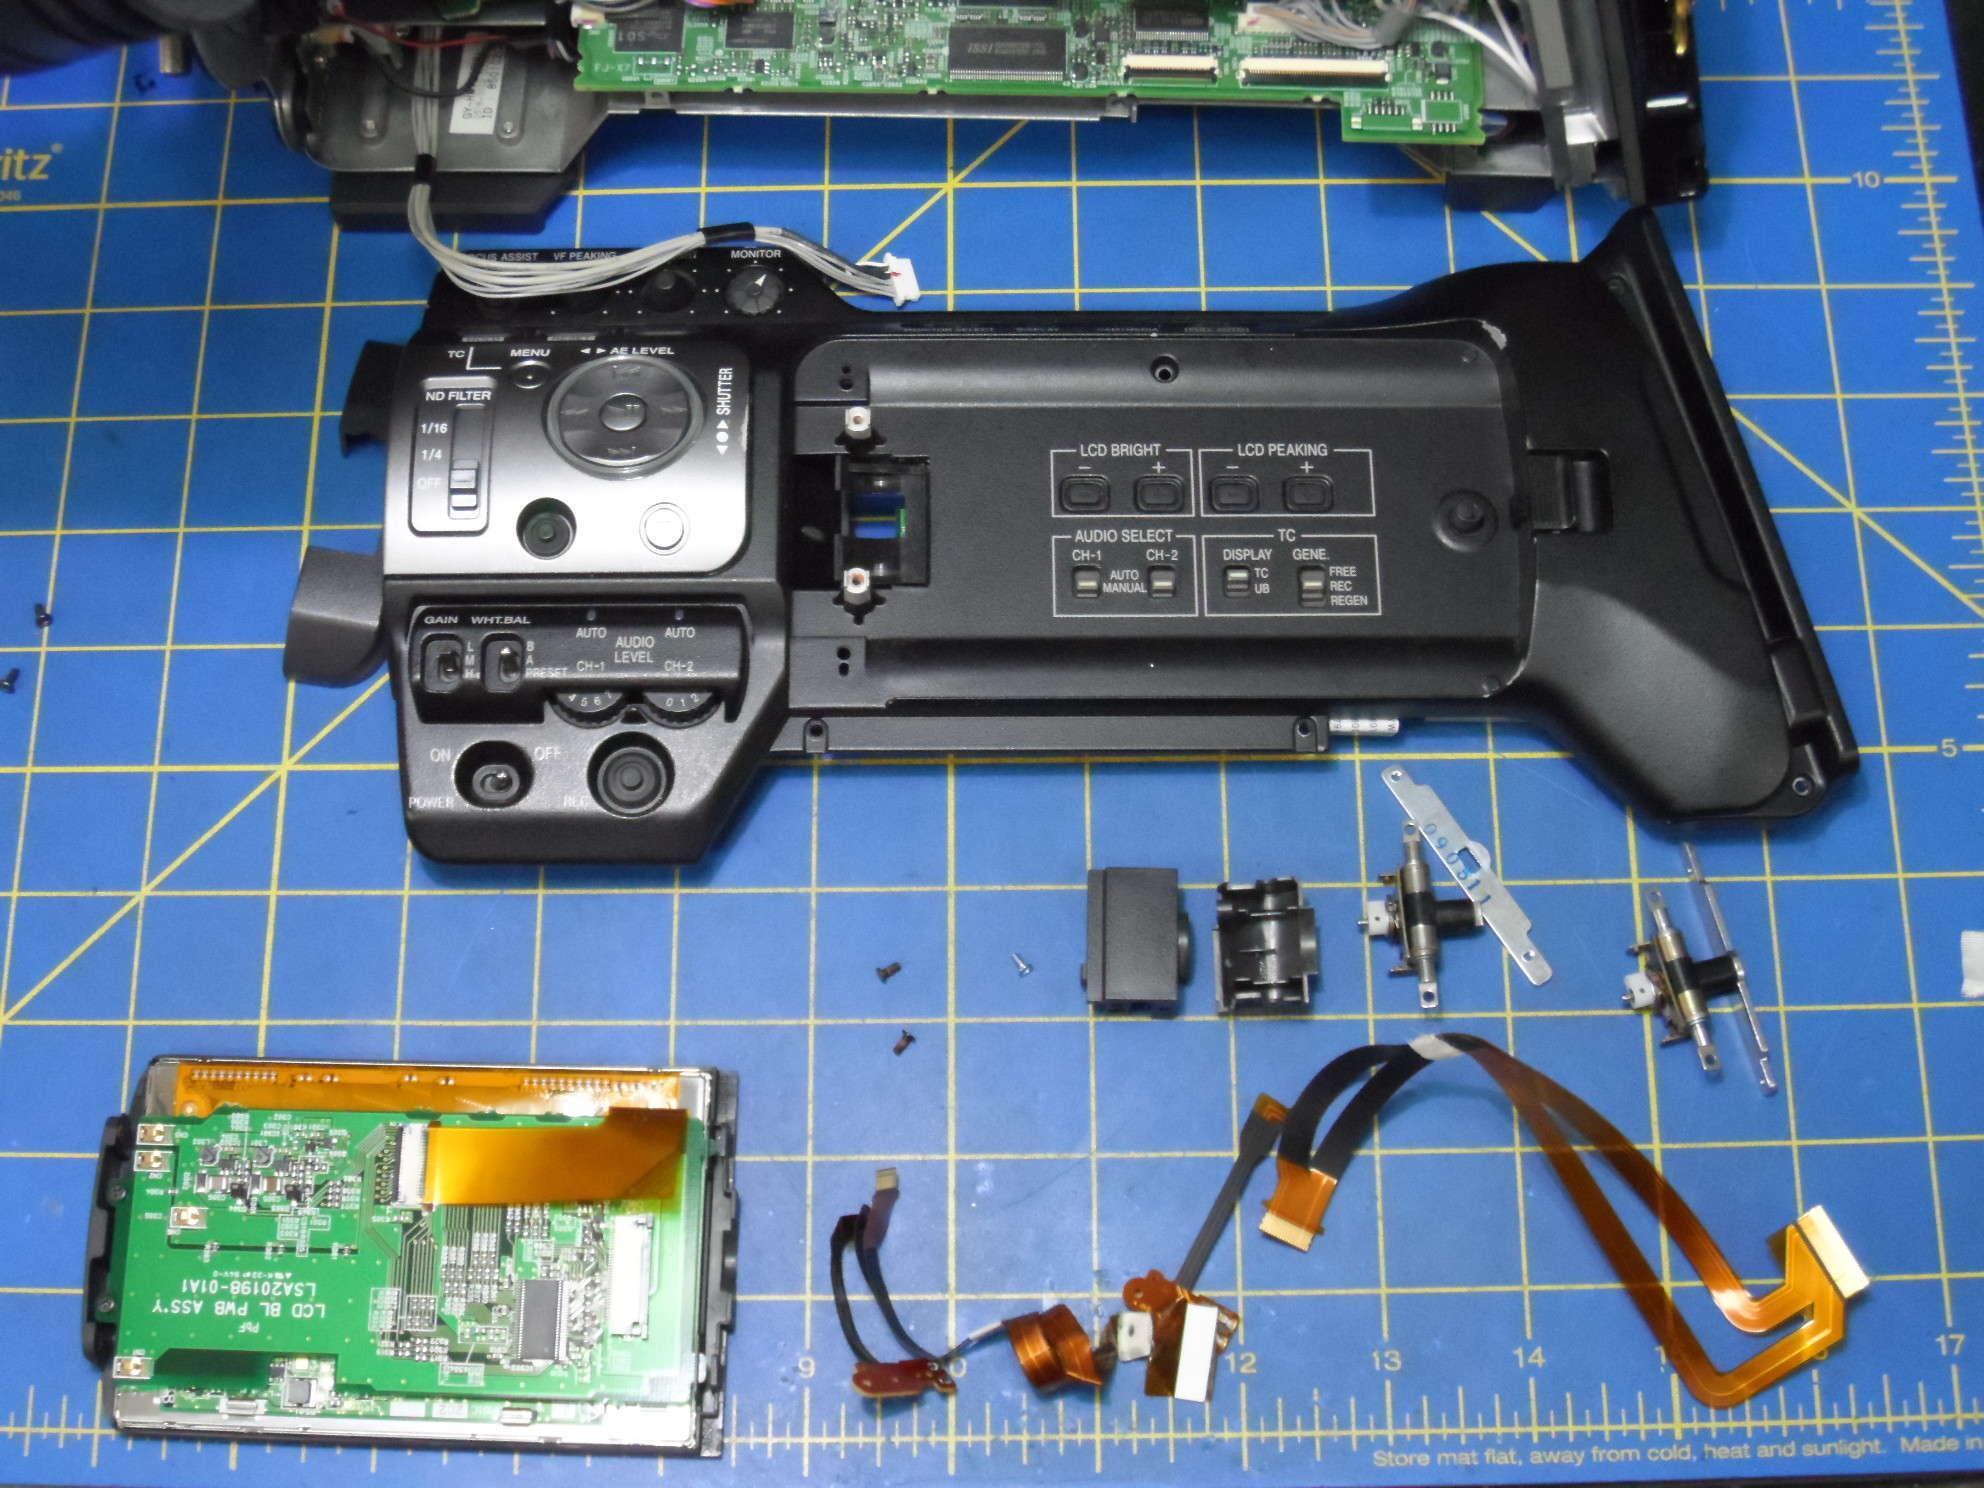 Jvc gz-hd7 60gb hd 3ccd camcorder remote software manual ac comp.